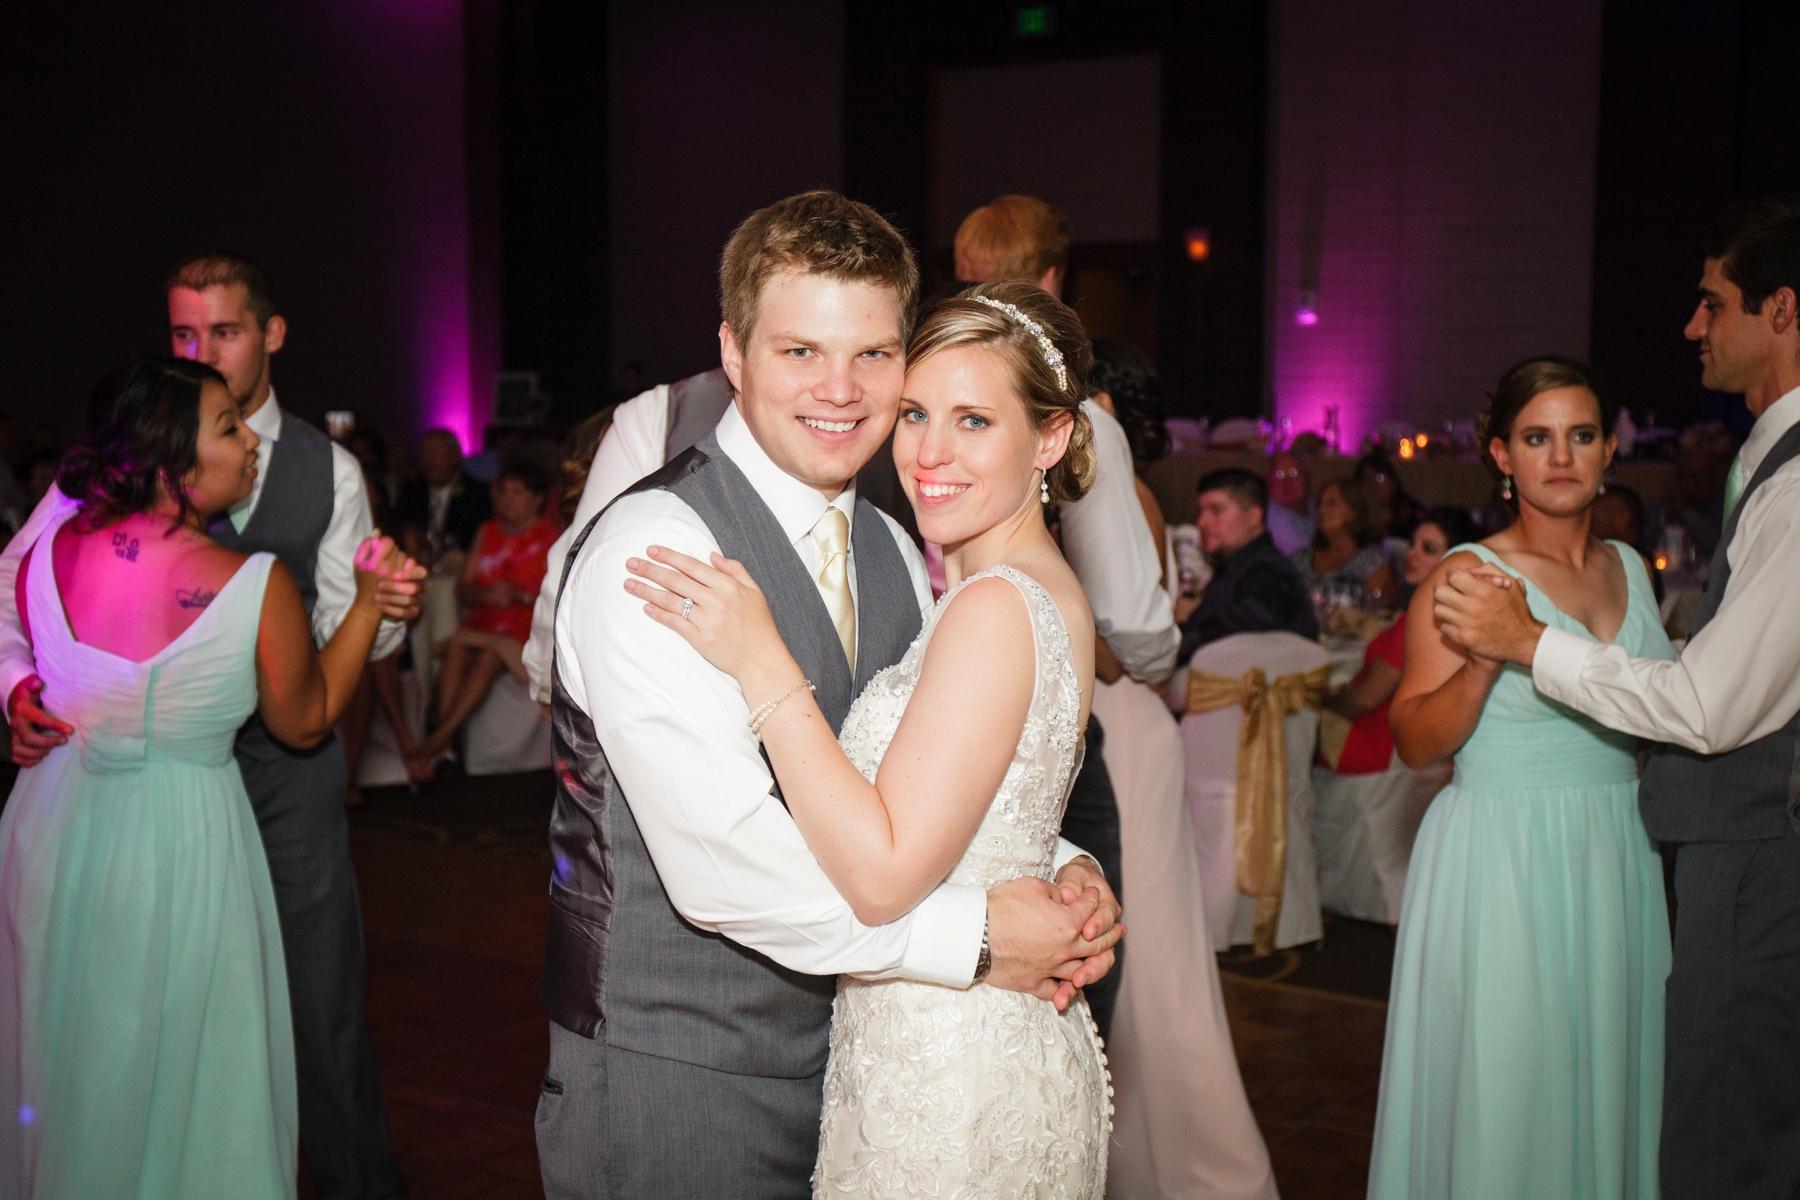 Ben_Jillian_Midland_Baycity_Wedding_0075.jpg